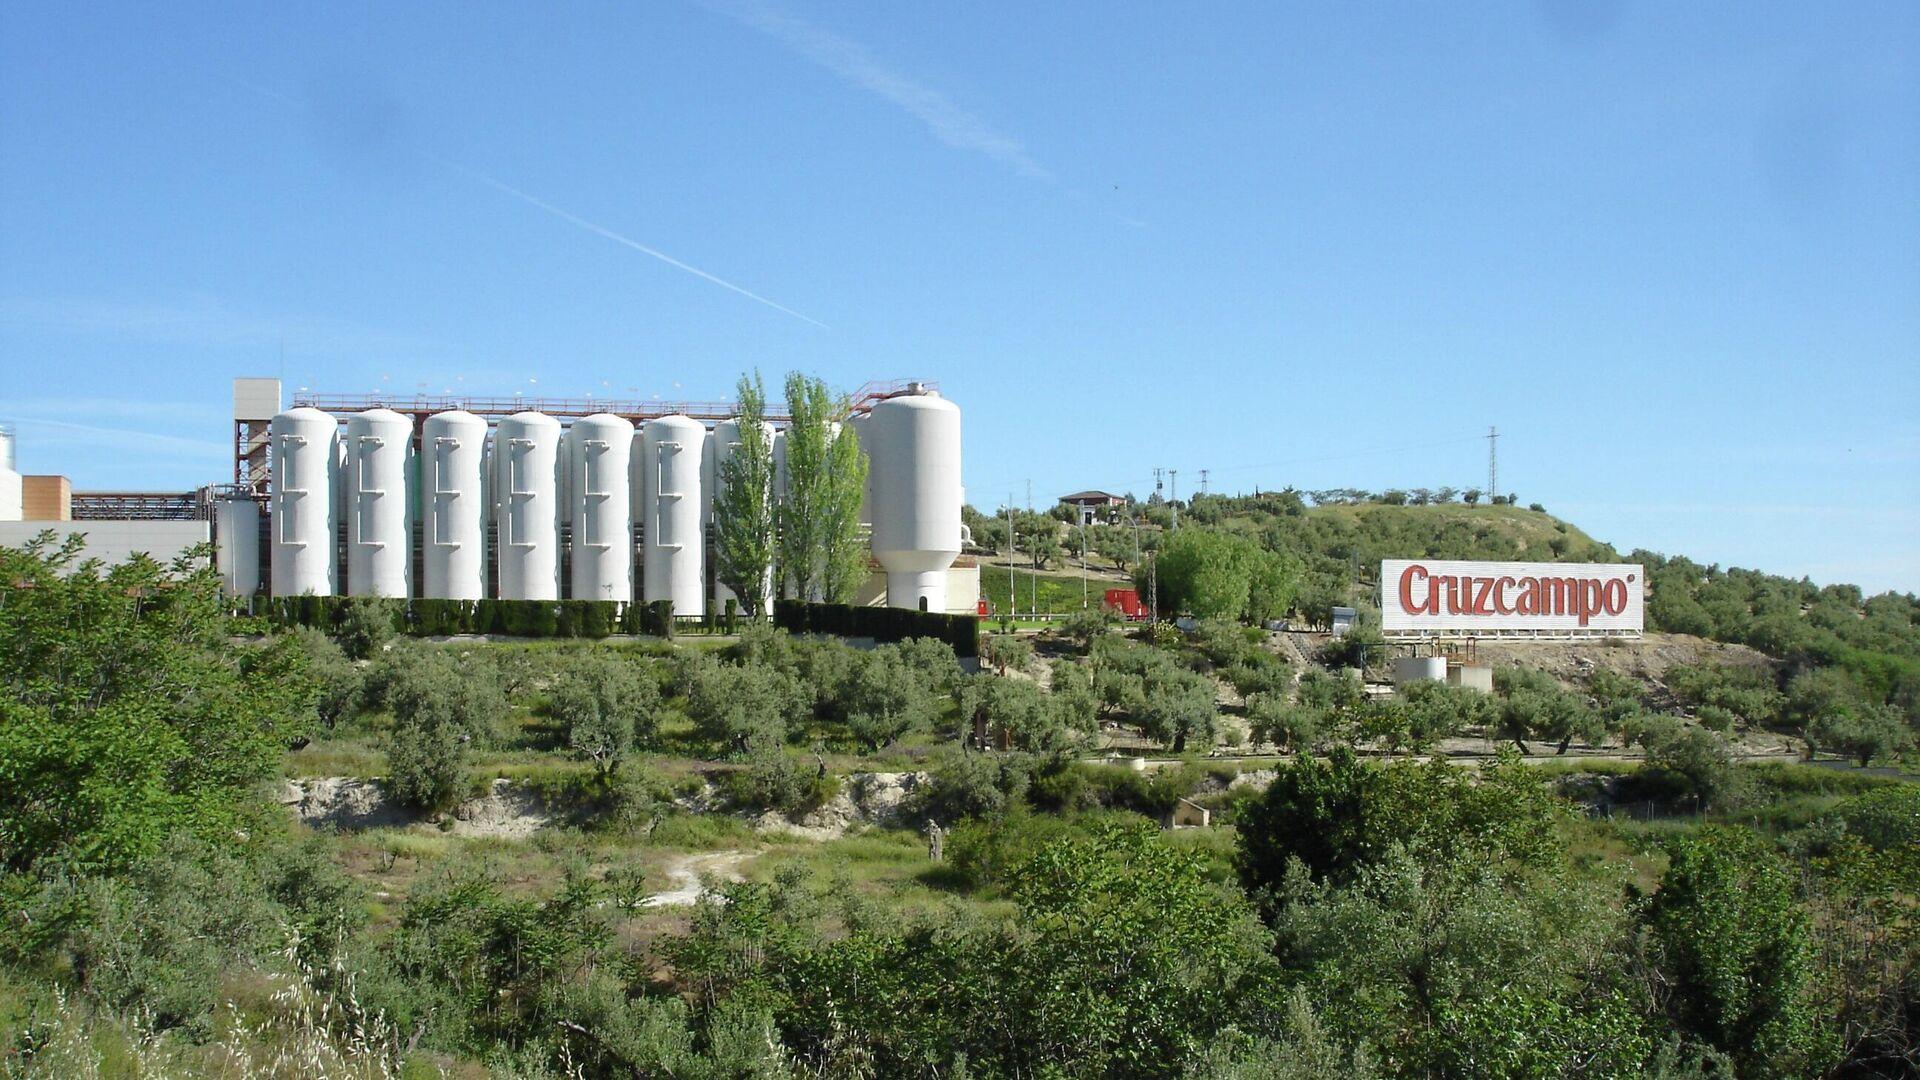 Fábrica de Heineken en La Imora (Jaén) - Sputnik Mundo, 1920, 08.03.2021